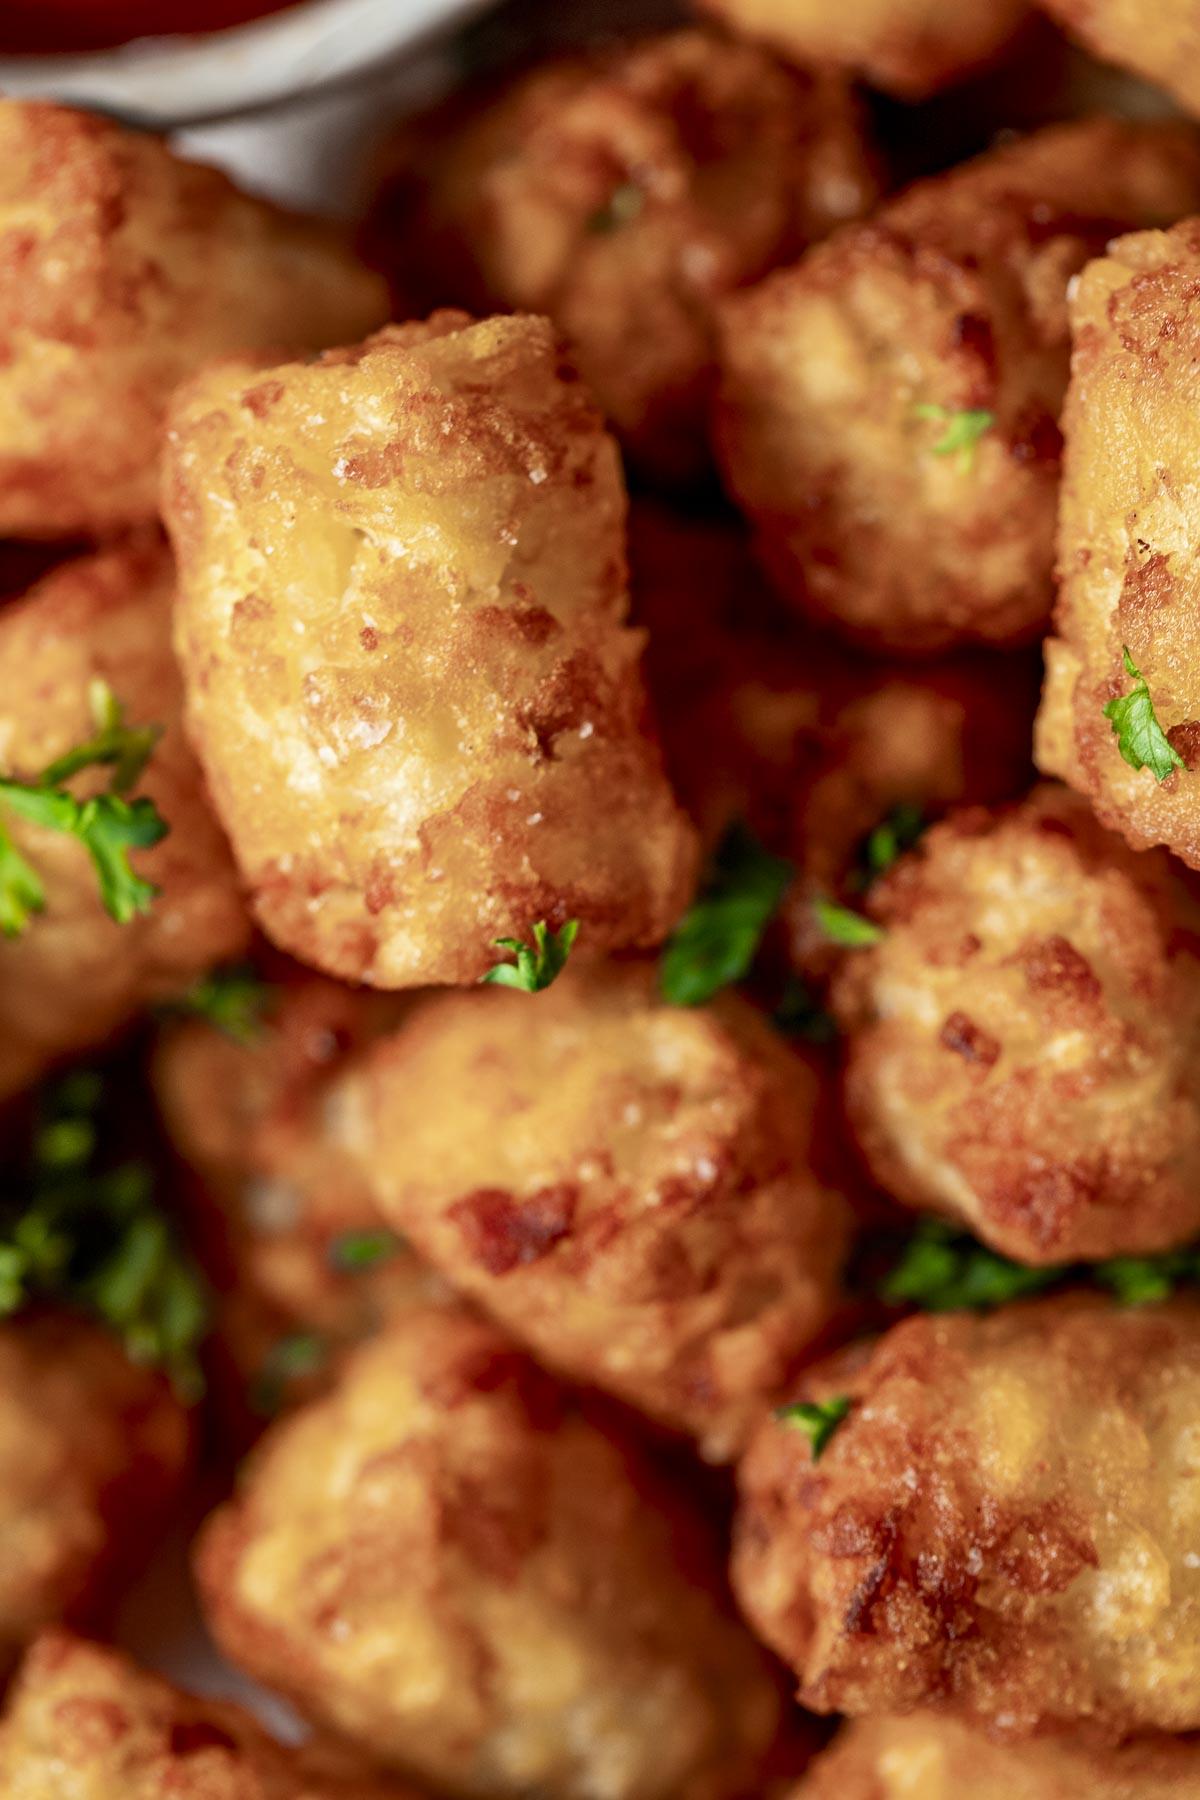 Close up of crispy air fryer tater tots.